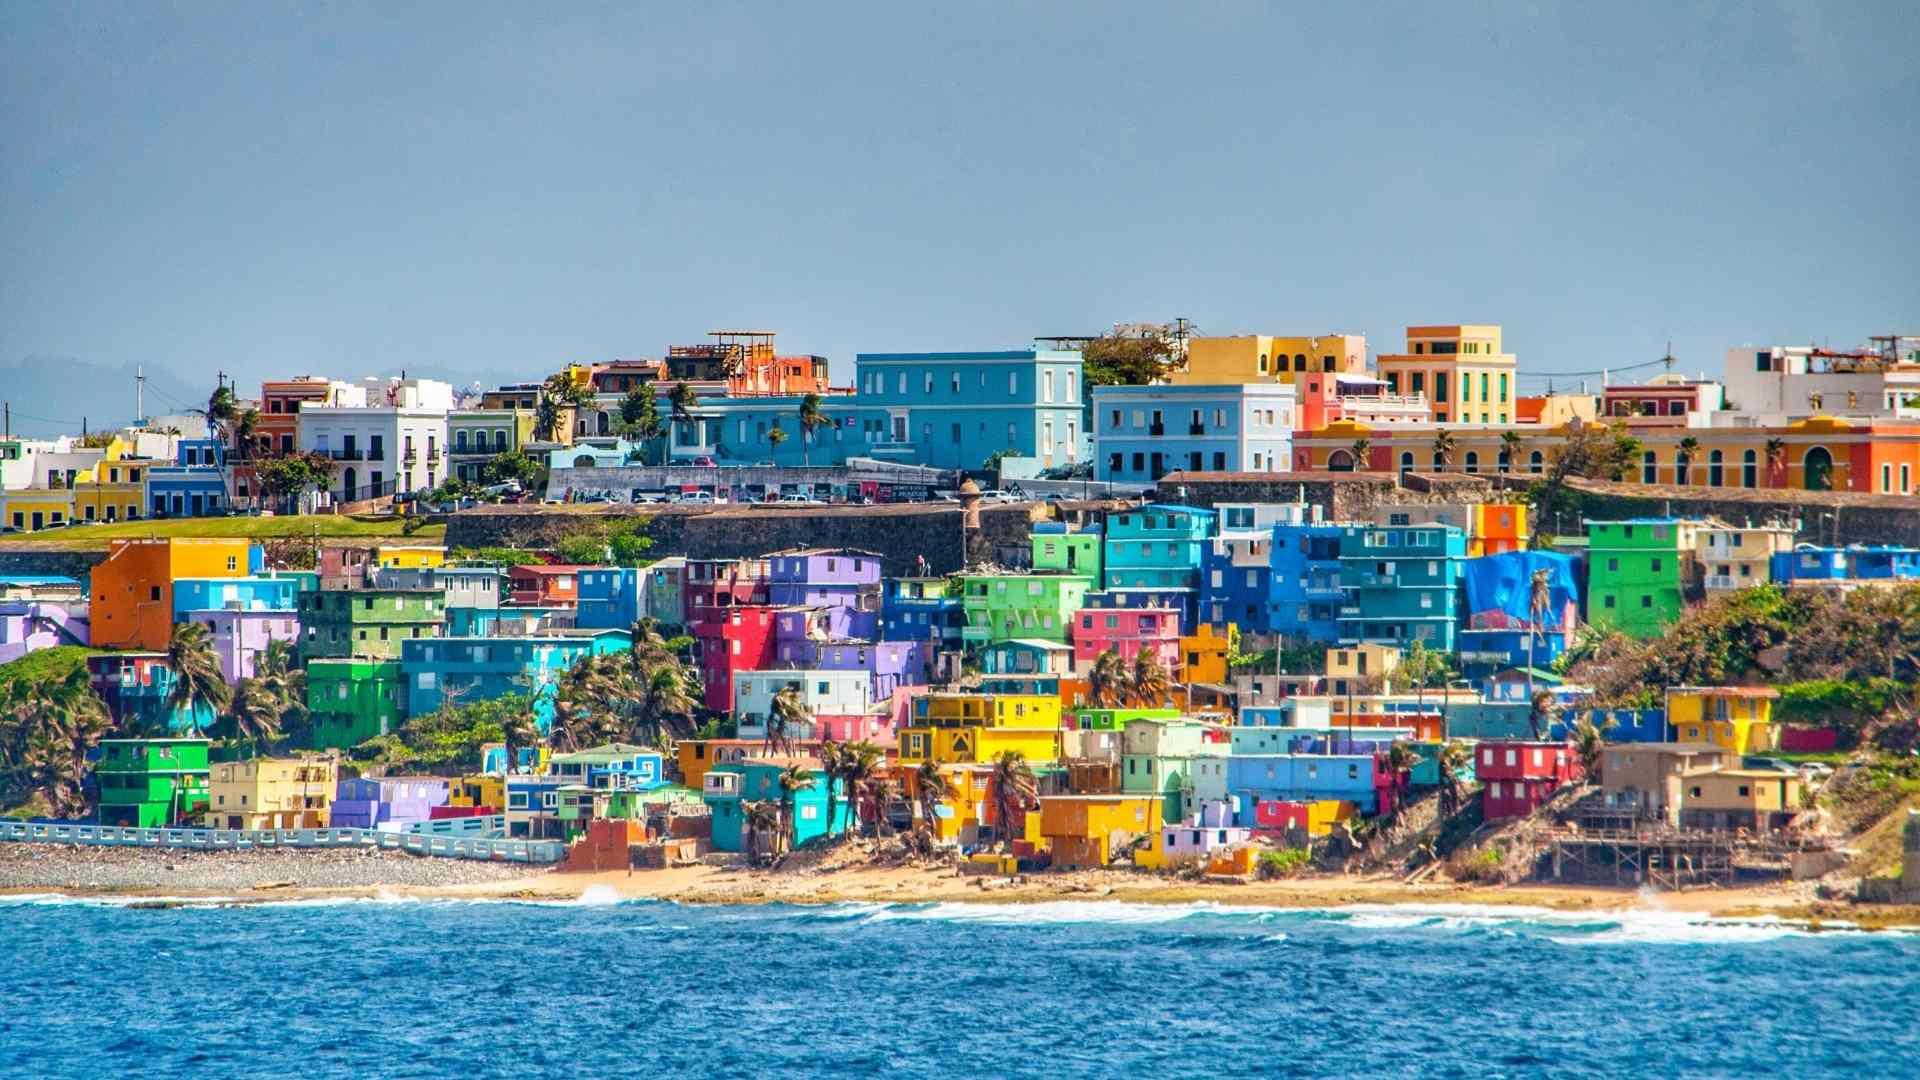 Puerto Rico cruise port